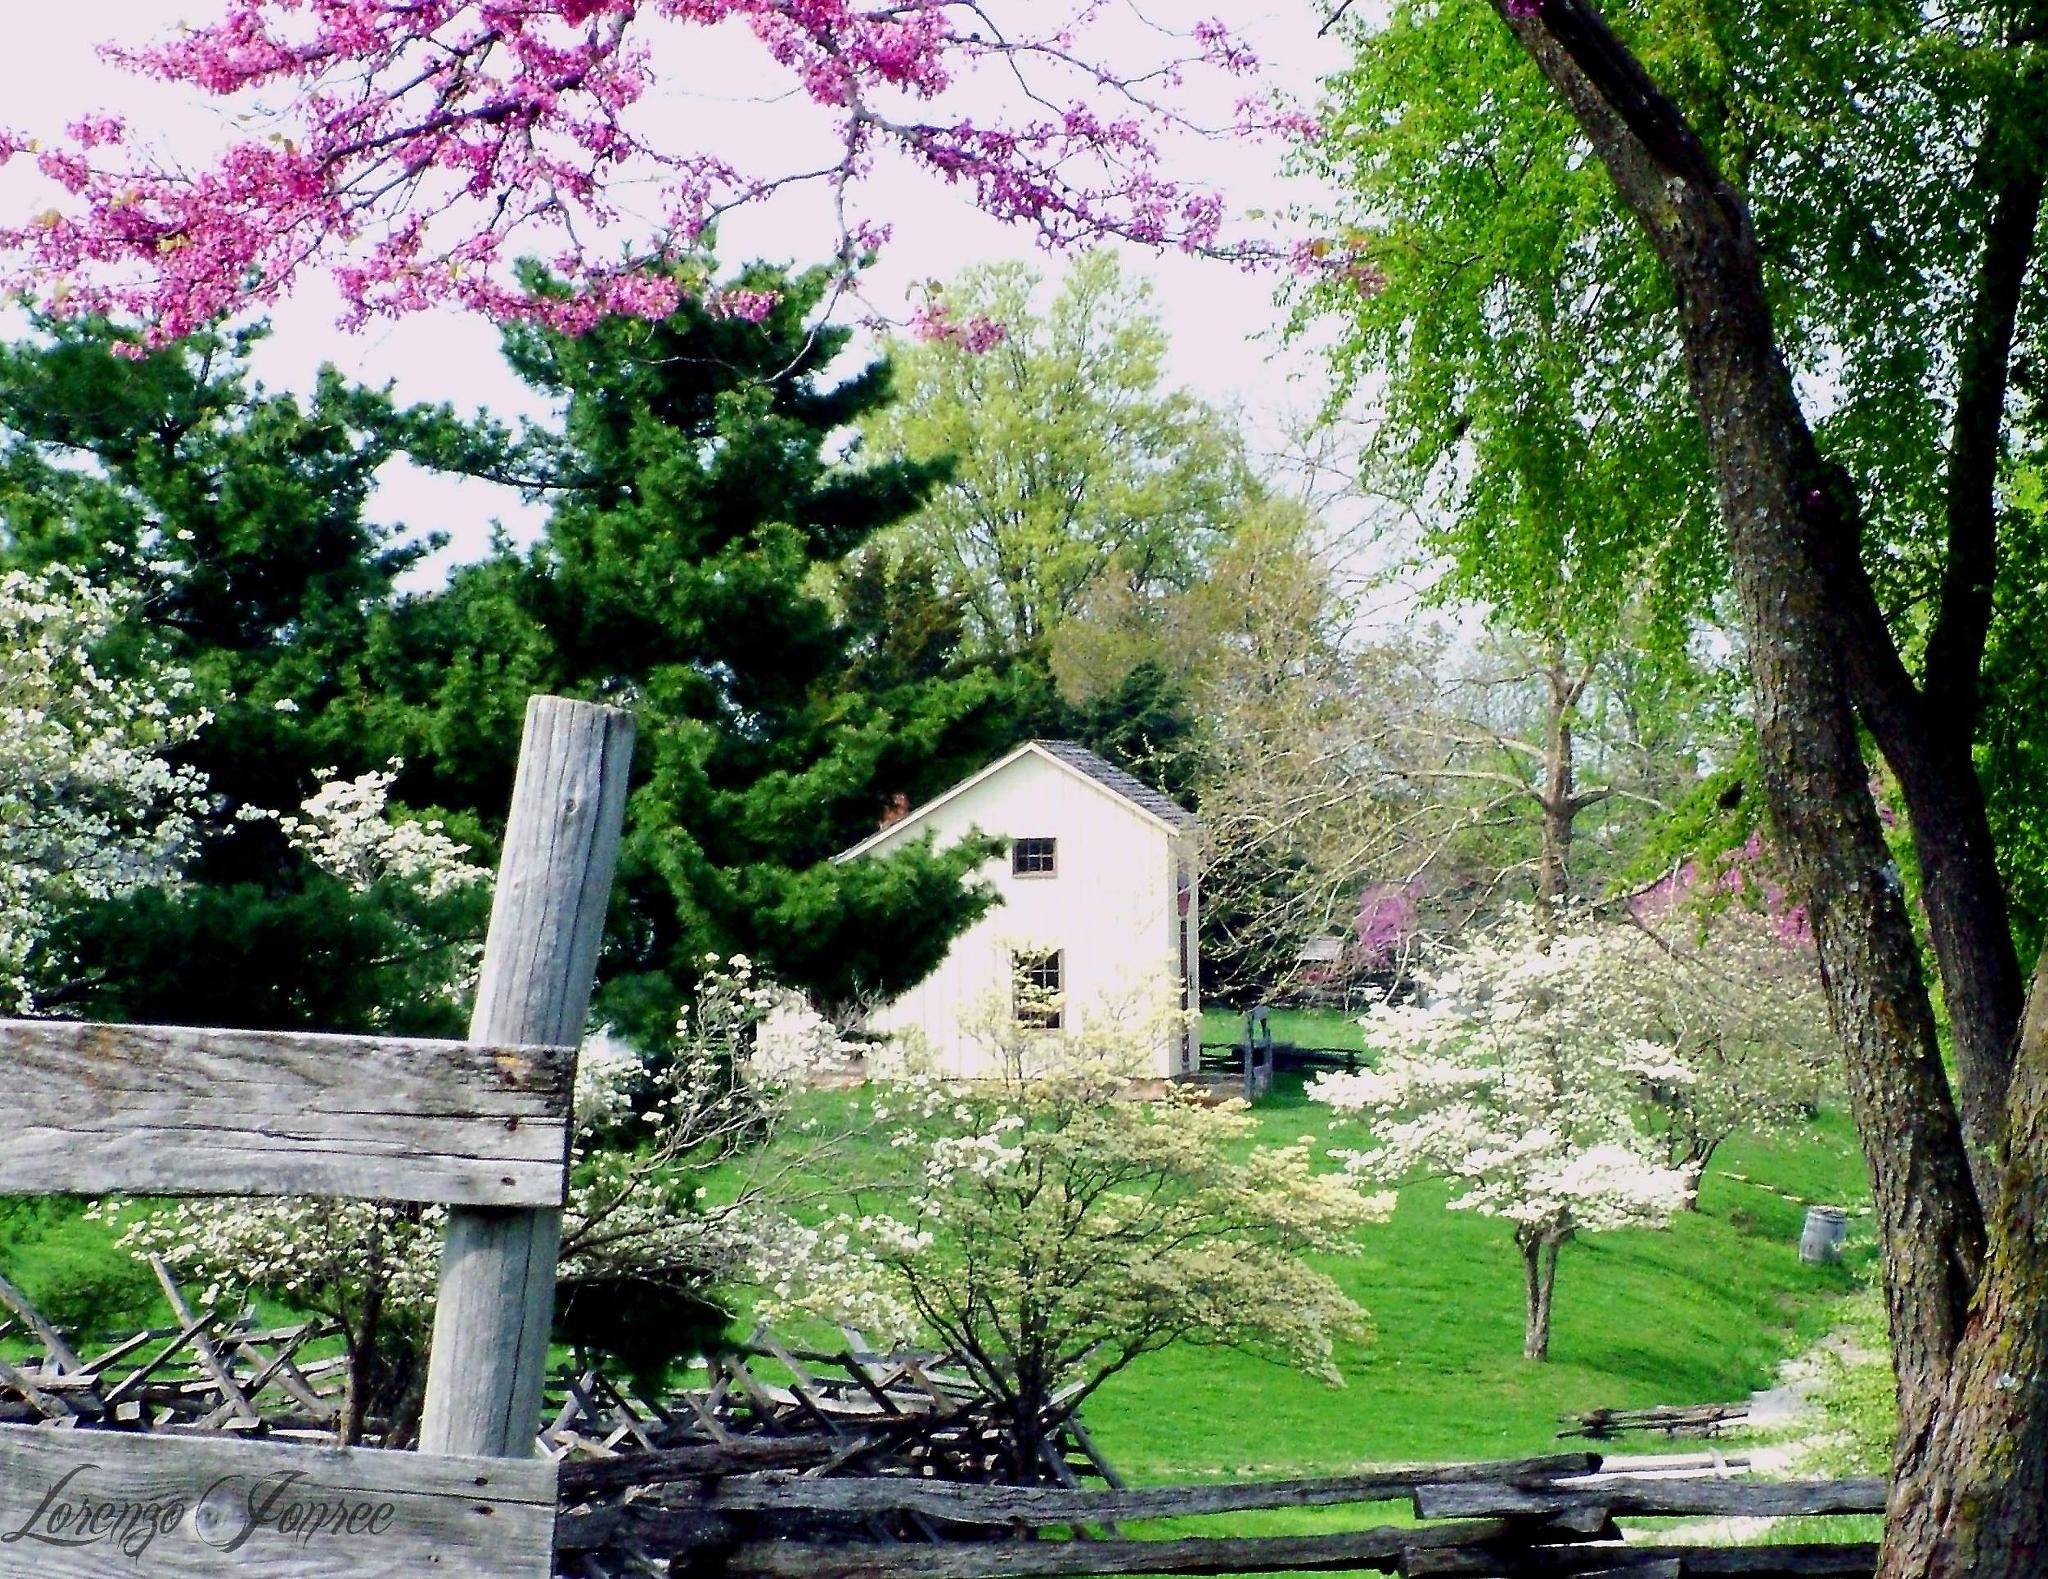 Rural Missouri In Spring  4 of 4  by Lorenzo (Larry) Jonree